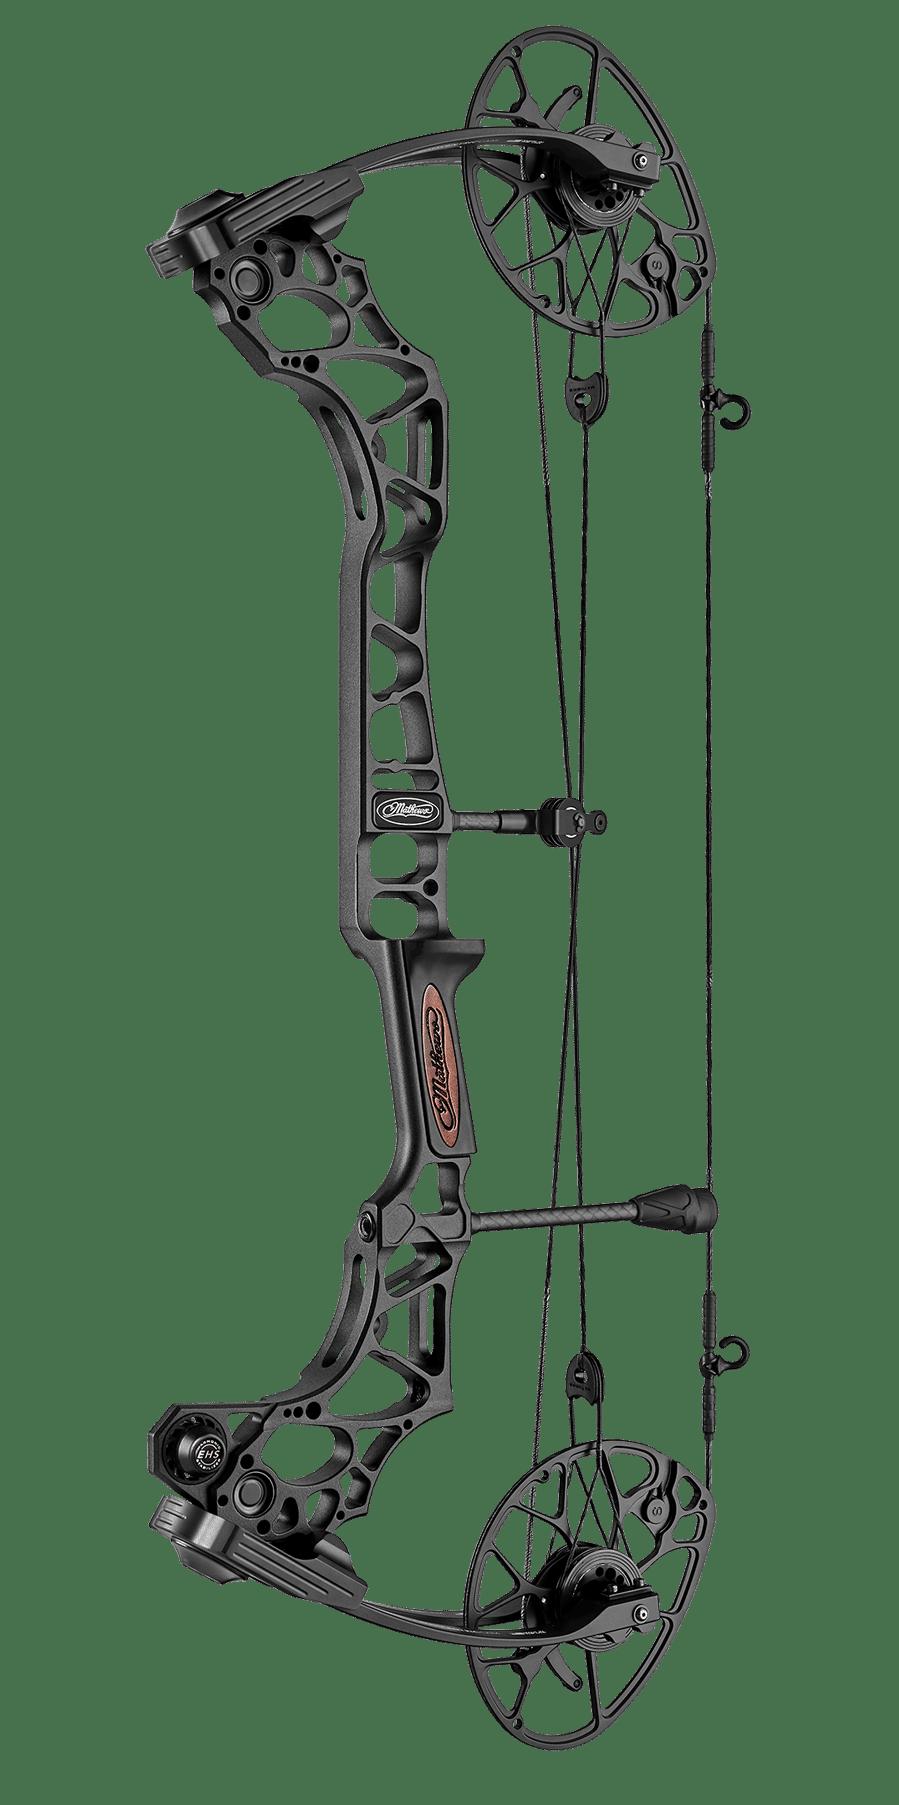 medium resolution of triax mathews archery bear compound bow parts diagram genesis bow diagram